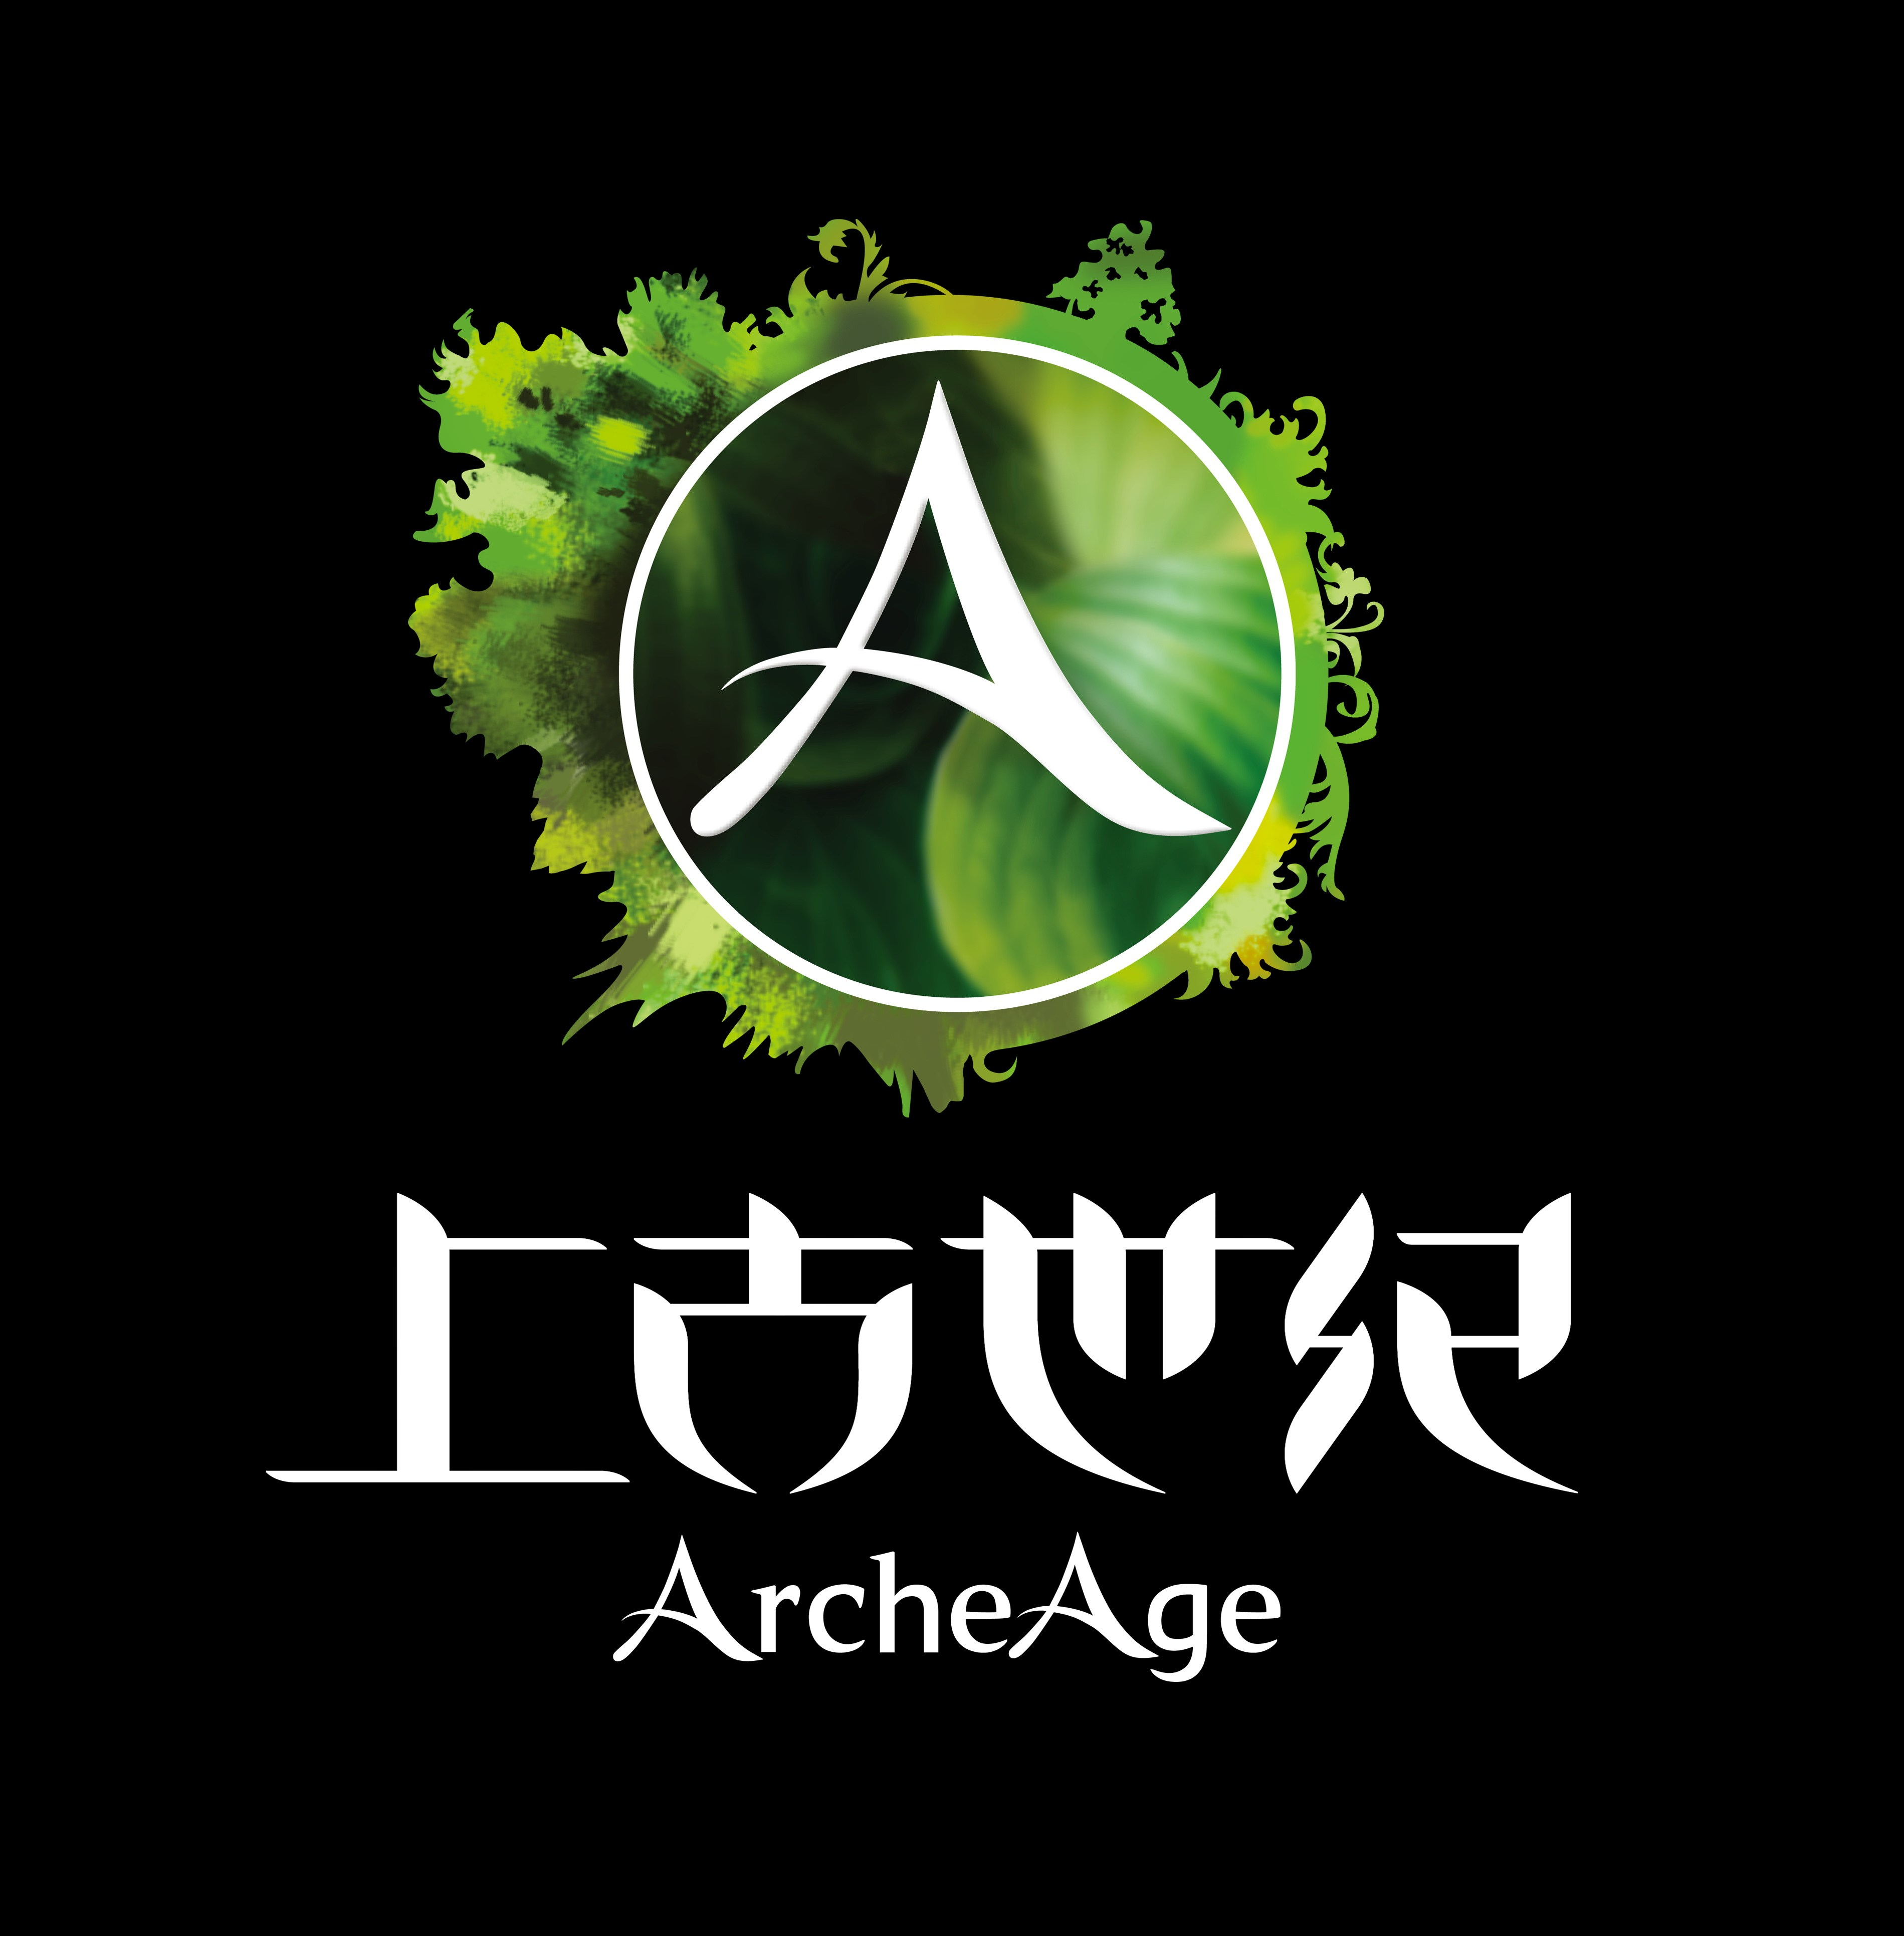 Archeage Logos